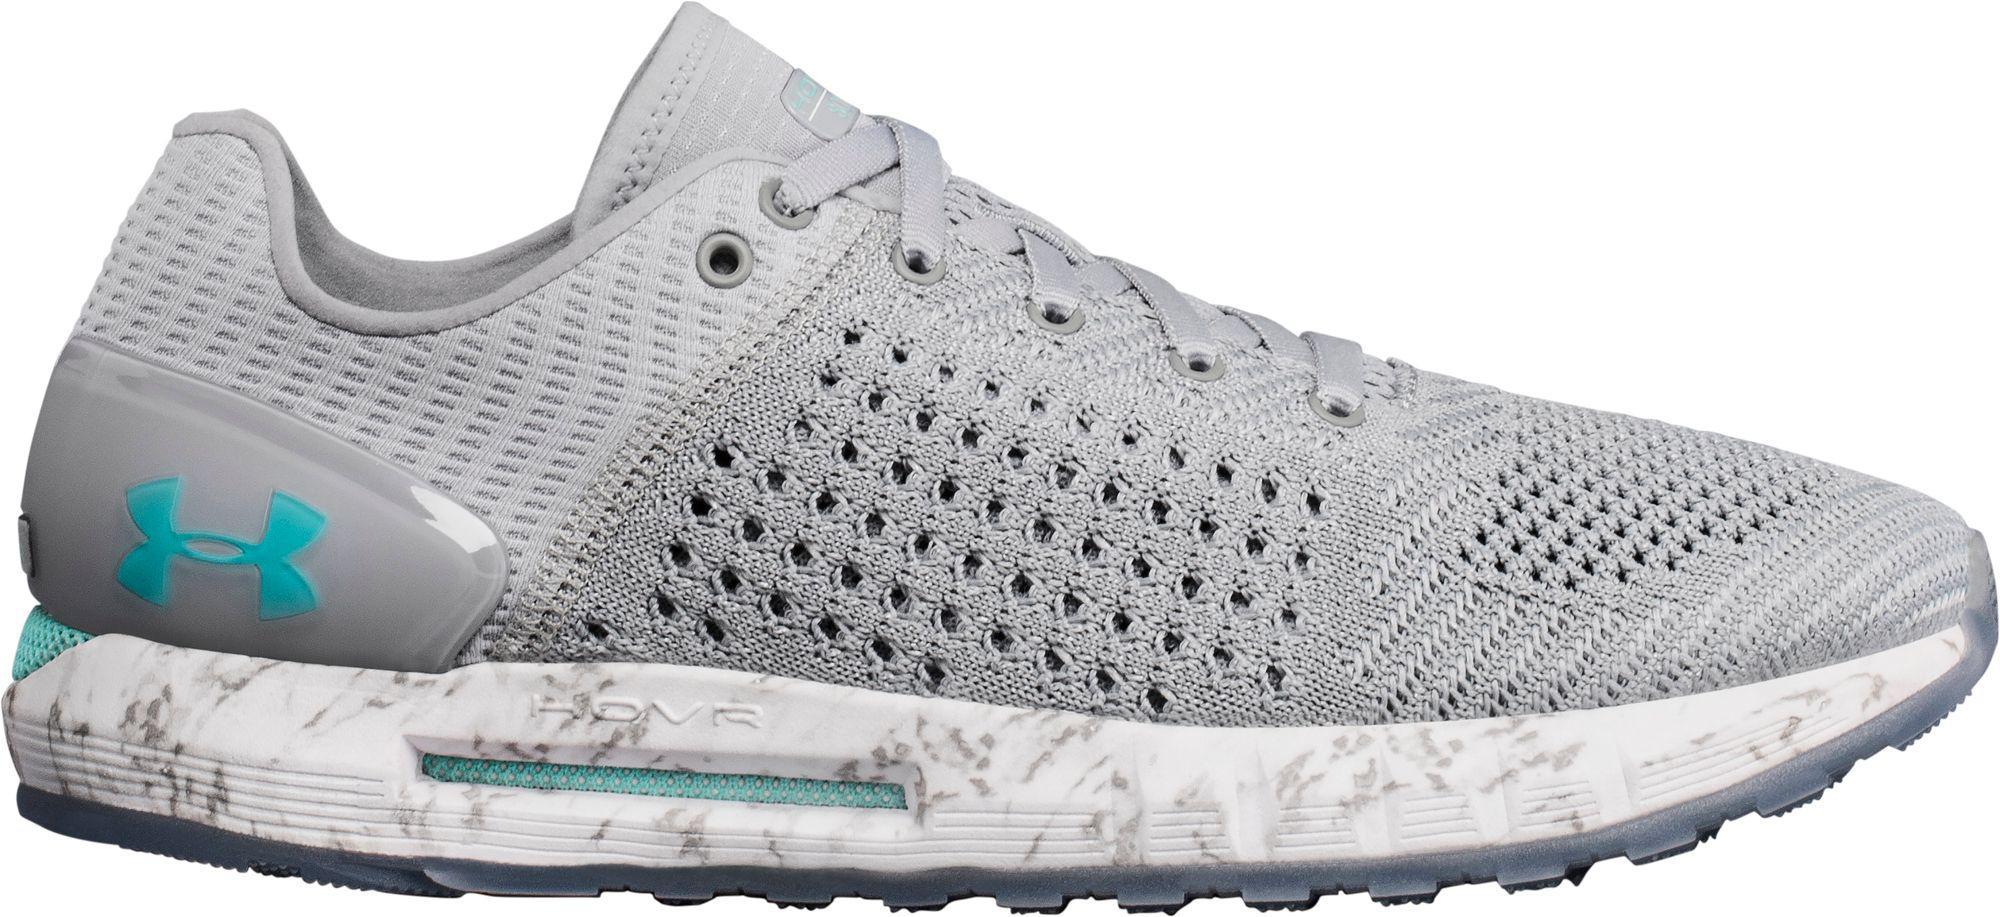 buy online 879b0 5040c Women's Gray Hovr Sonic Running Shoes